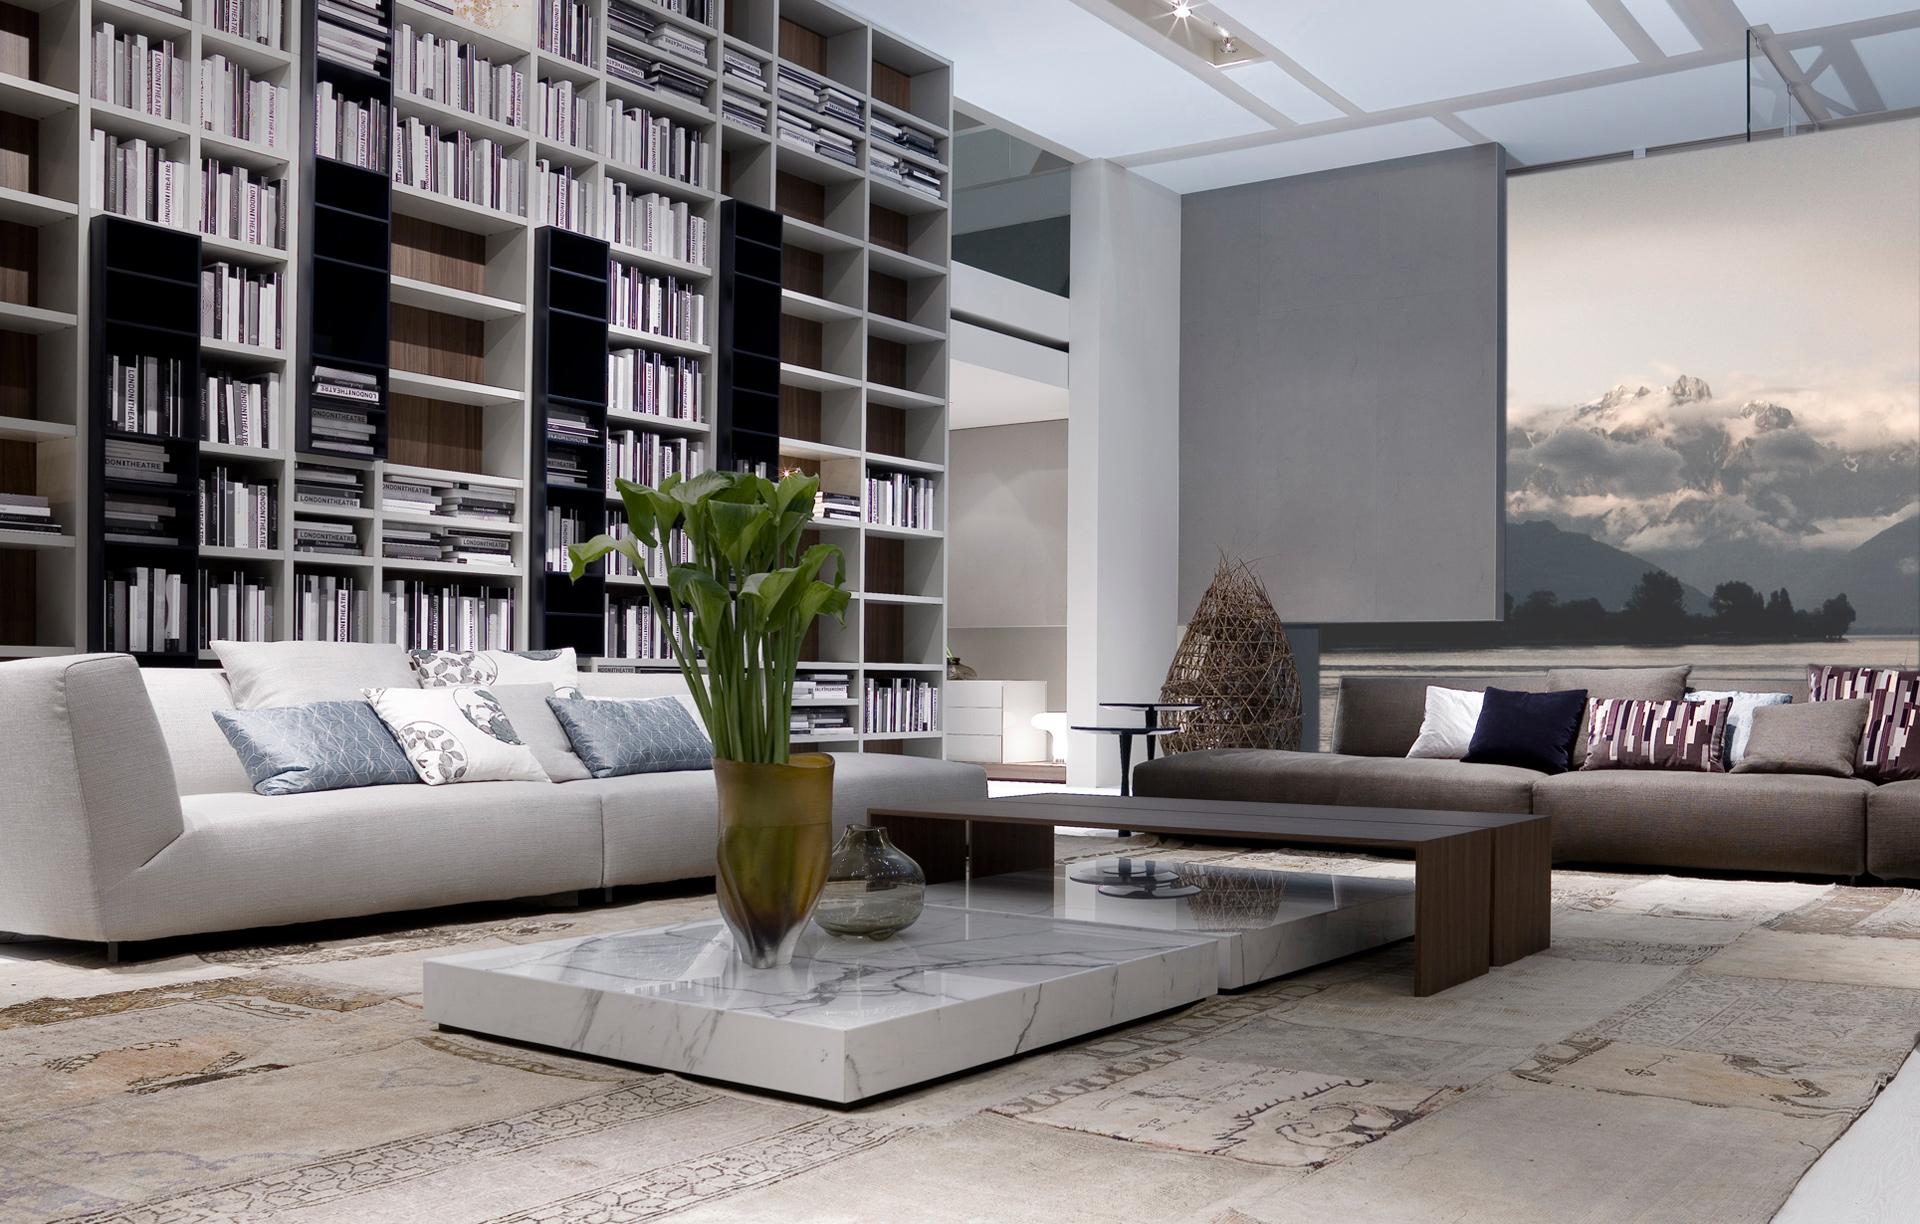 Librer a y sof s modulares de poliform for Interior designer famosi